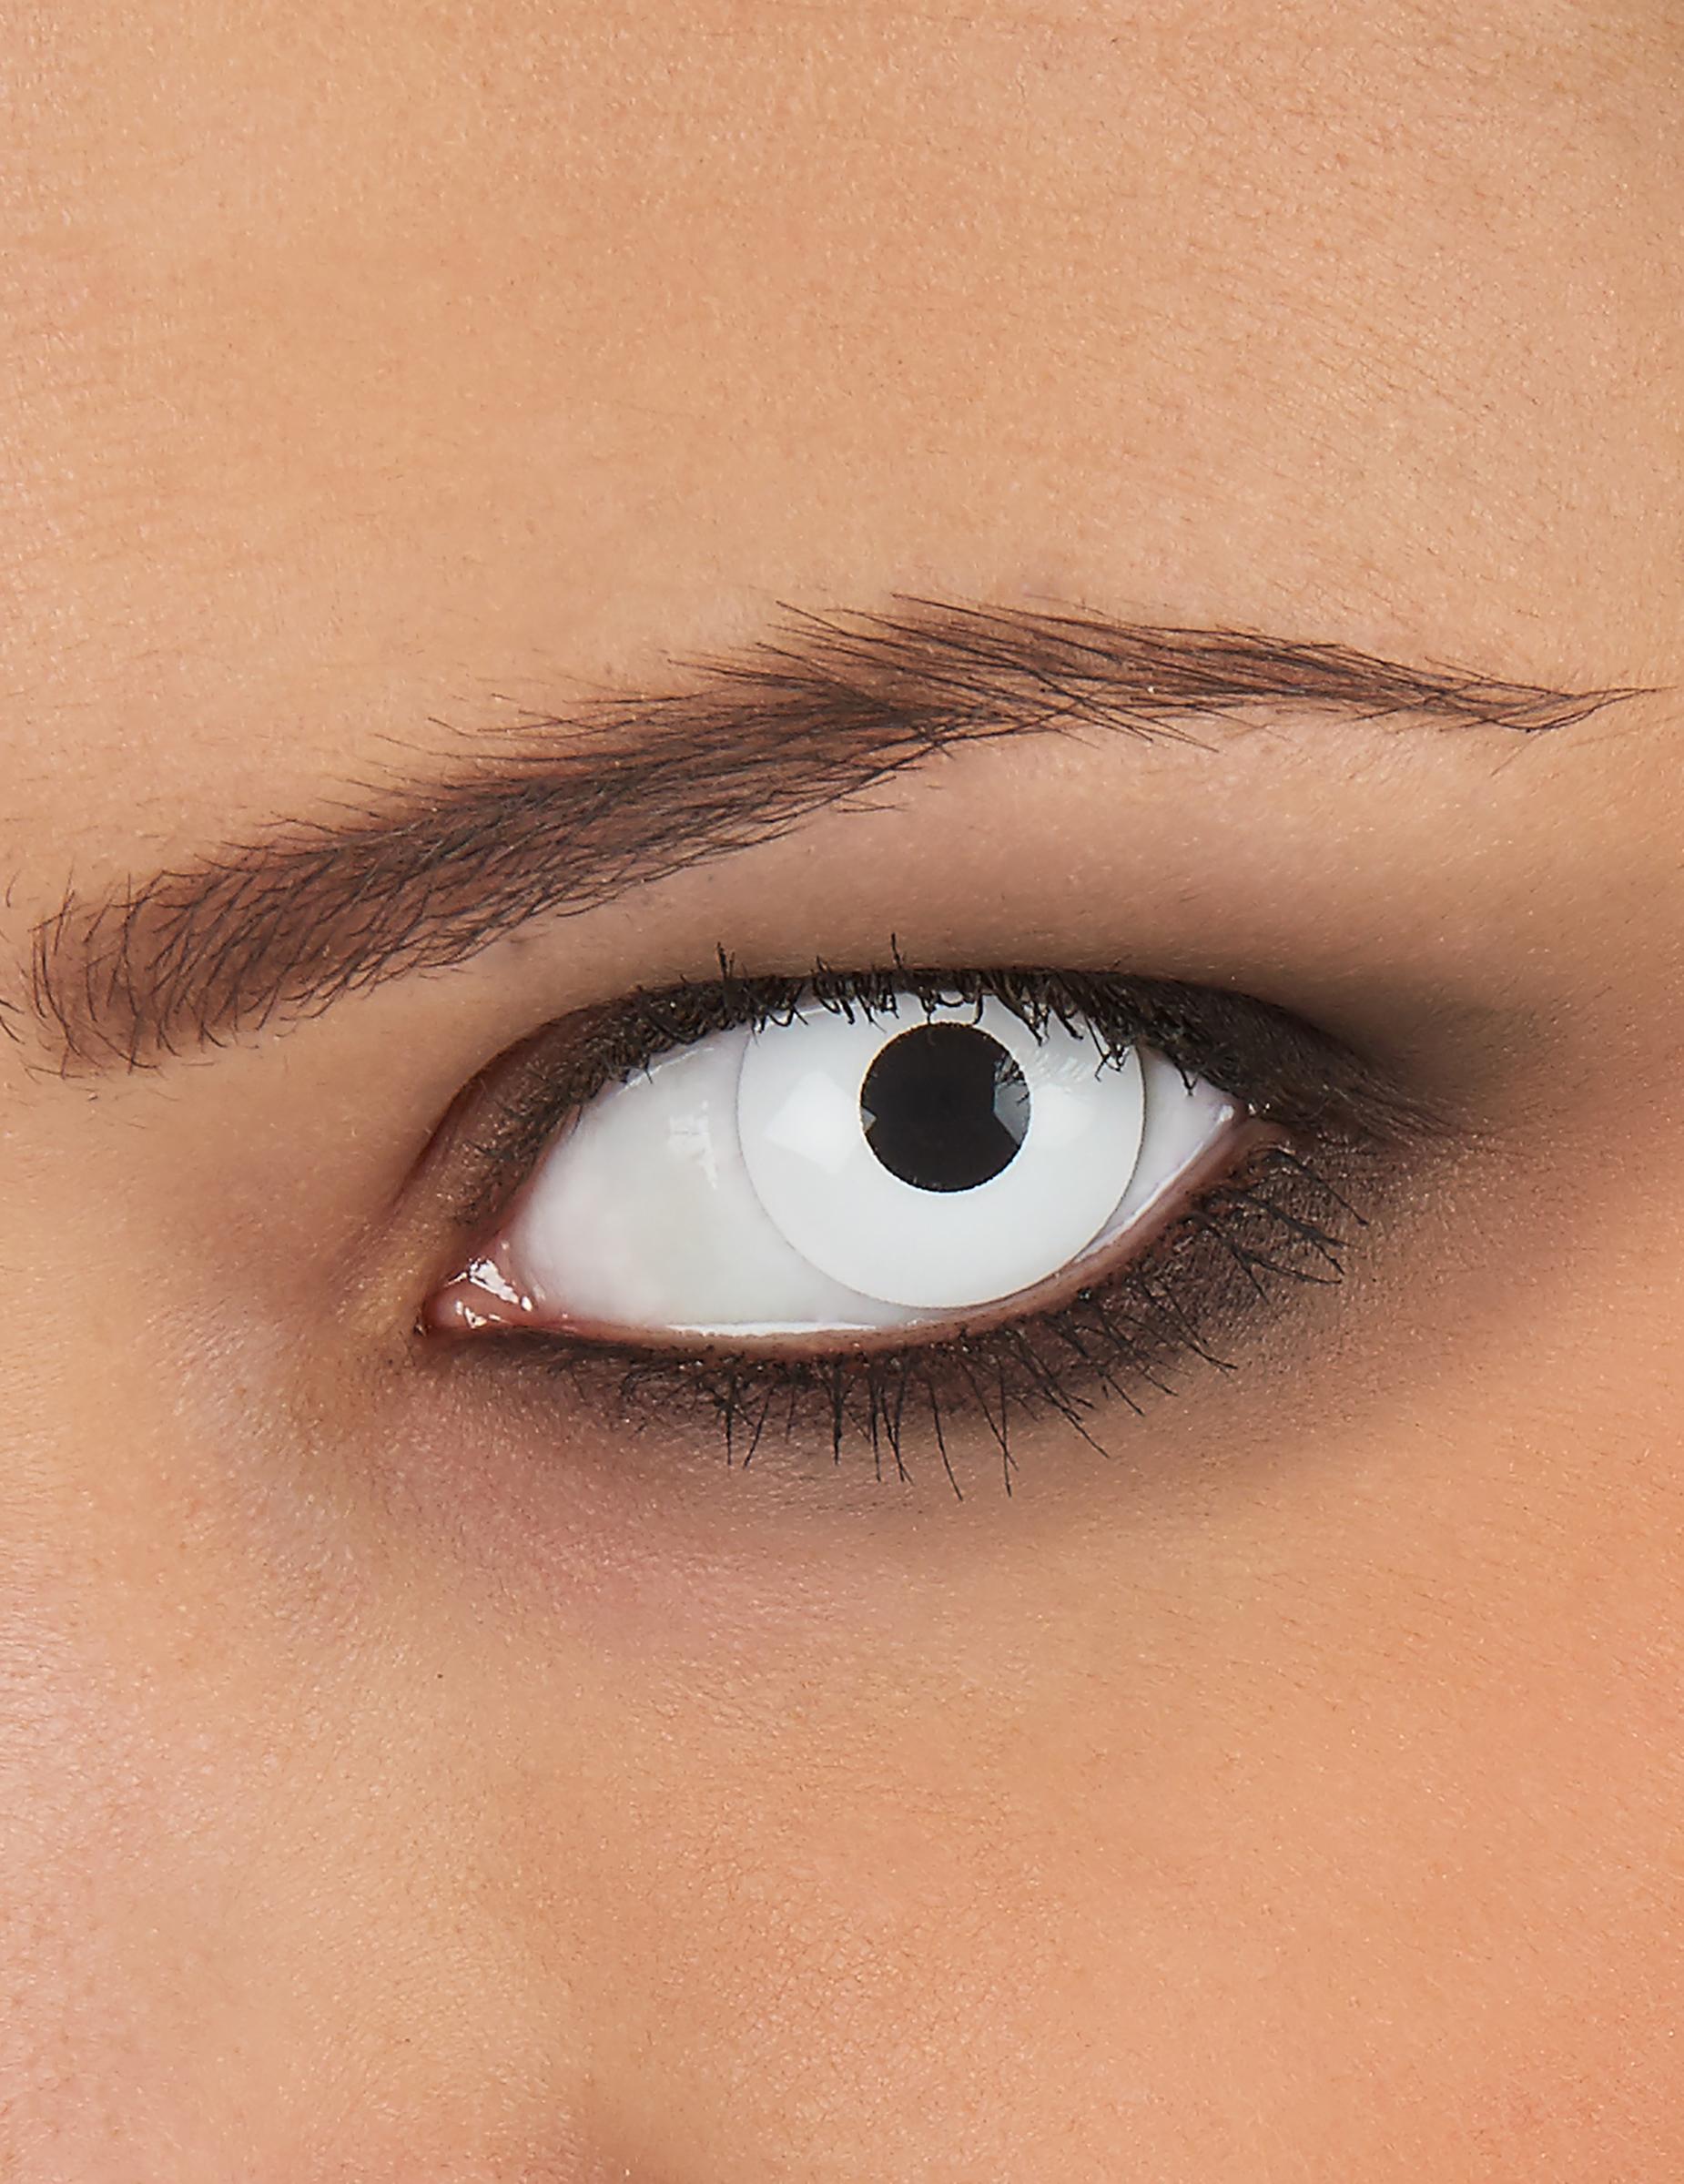 weisse kontaktlinsen f r erwachsene schminke und g nstige faschingskost me vegaoo. Black Bedroom Furniture Sets. Home Design Ideas